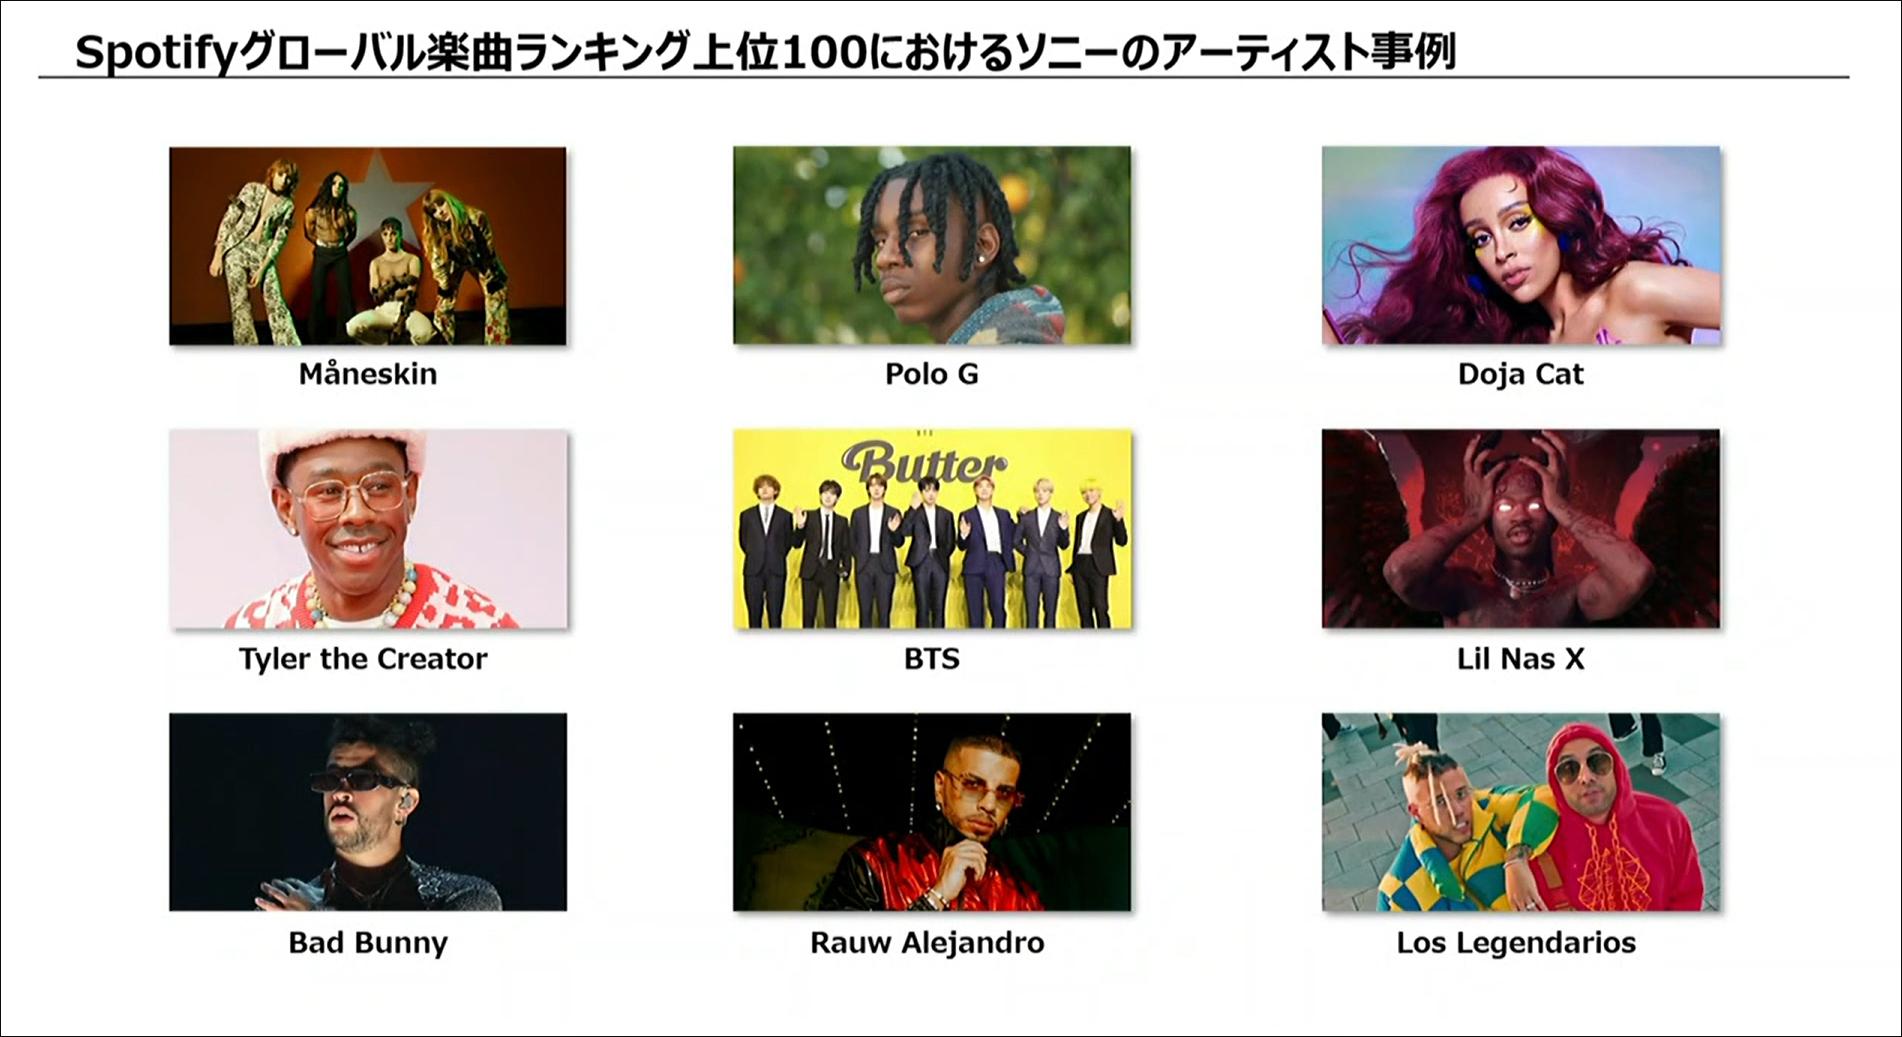 Spotifyグローバル楽曲ランキング上位100におけるソニーのアーティスト事例